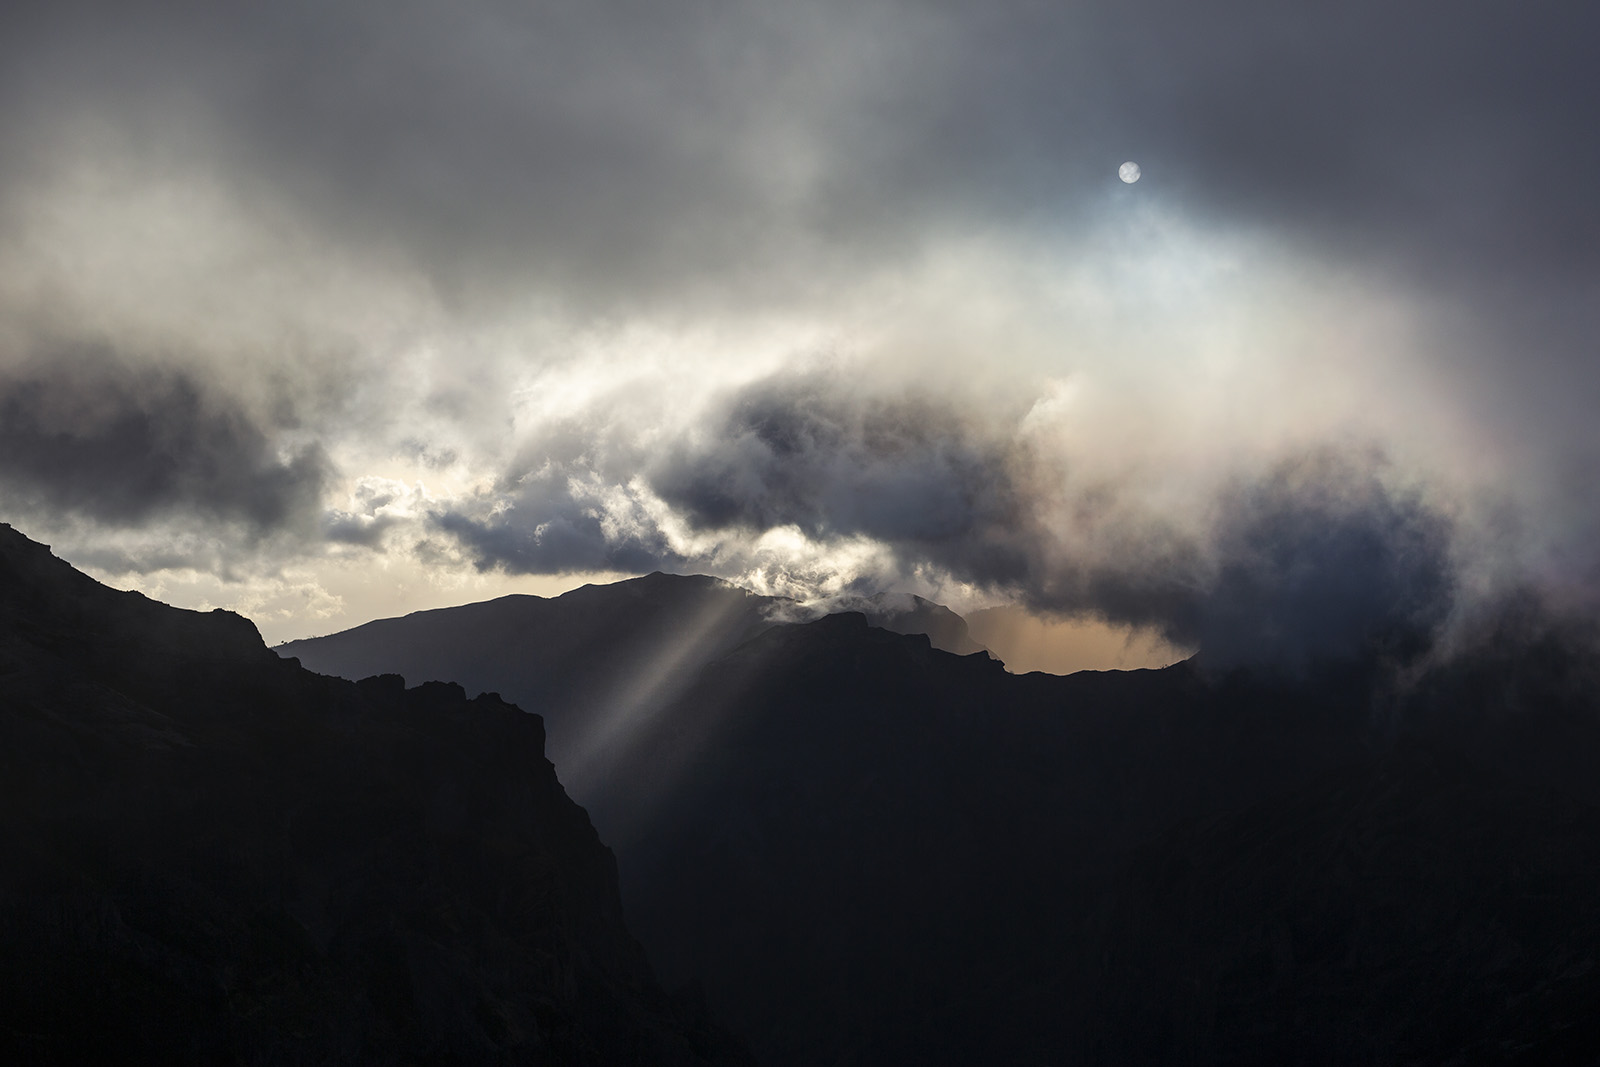 madere-madeira-island-portugal-voyage-travel-elise-julliard-photographe-photographer-pico-ruivo-arieiro-montagne-mountain-funchal-paysage-landscape